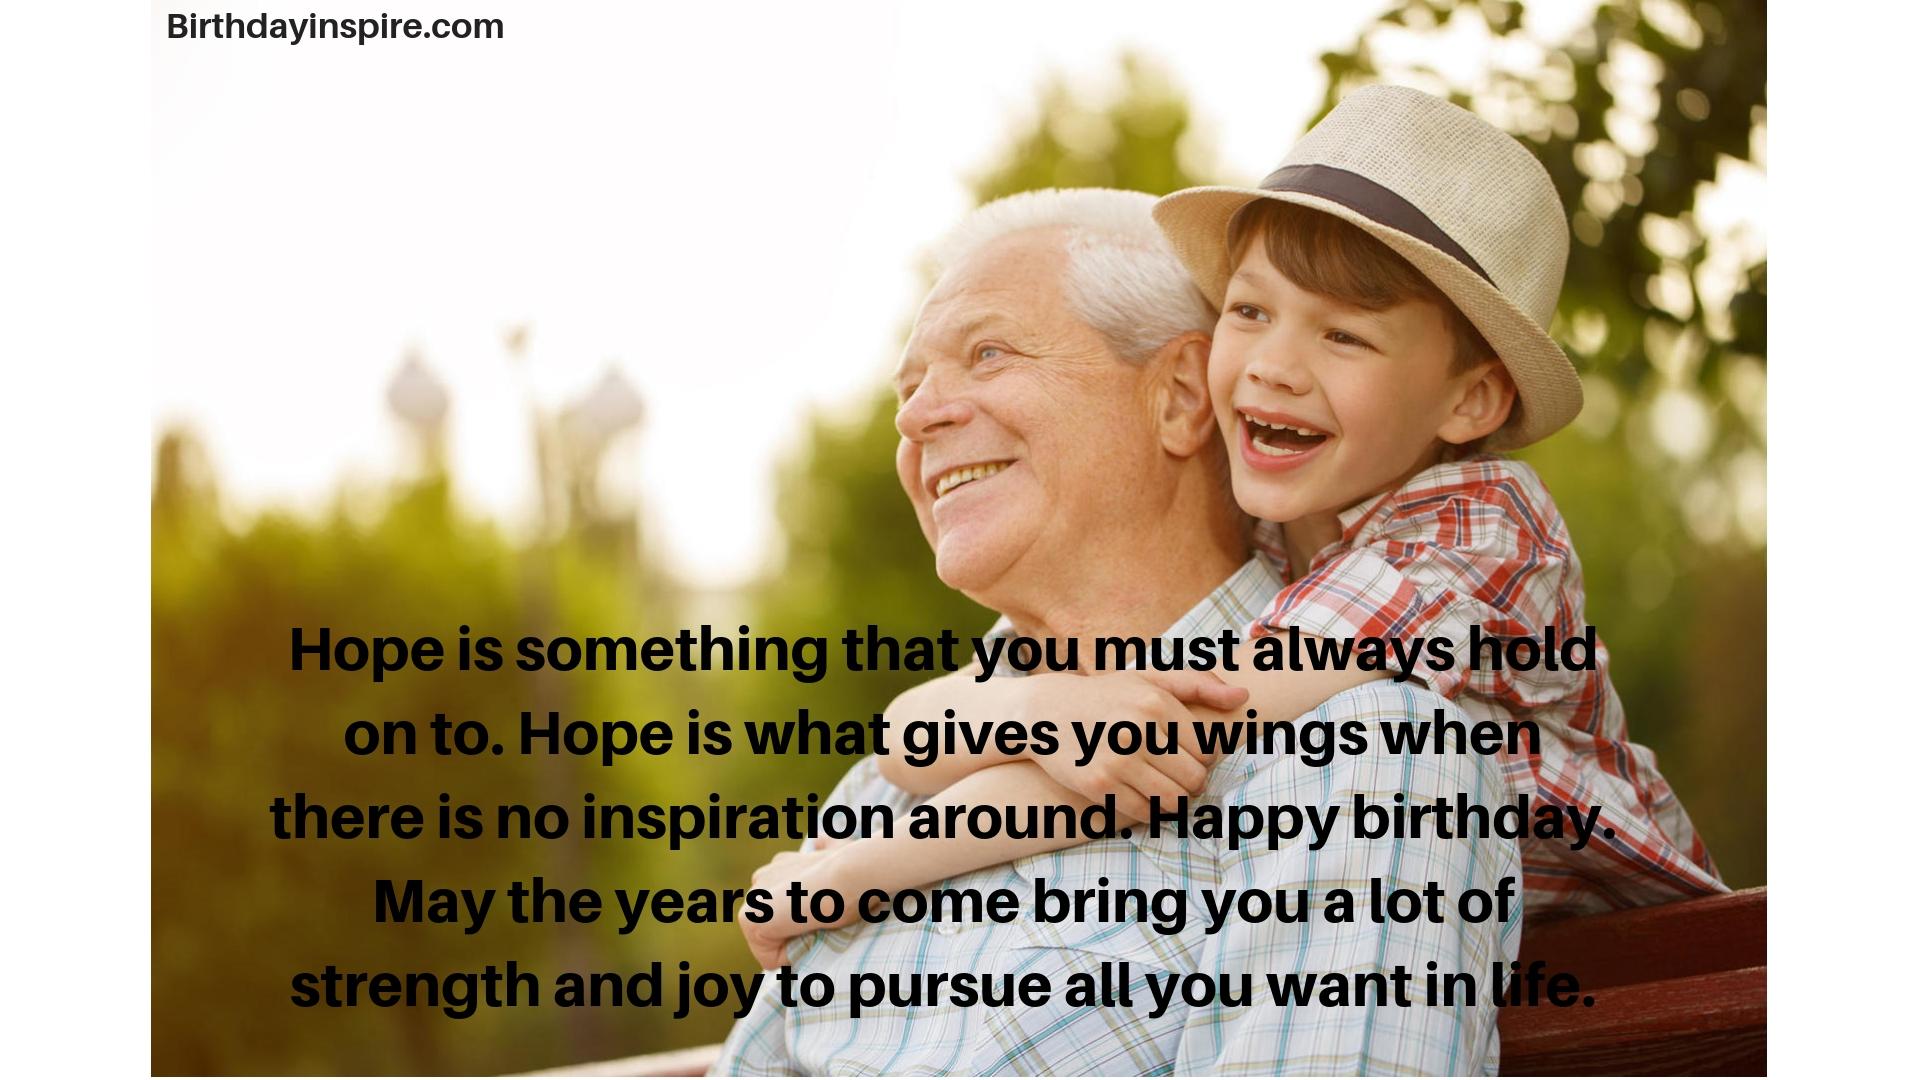 birthday message for grandson